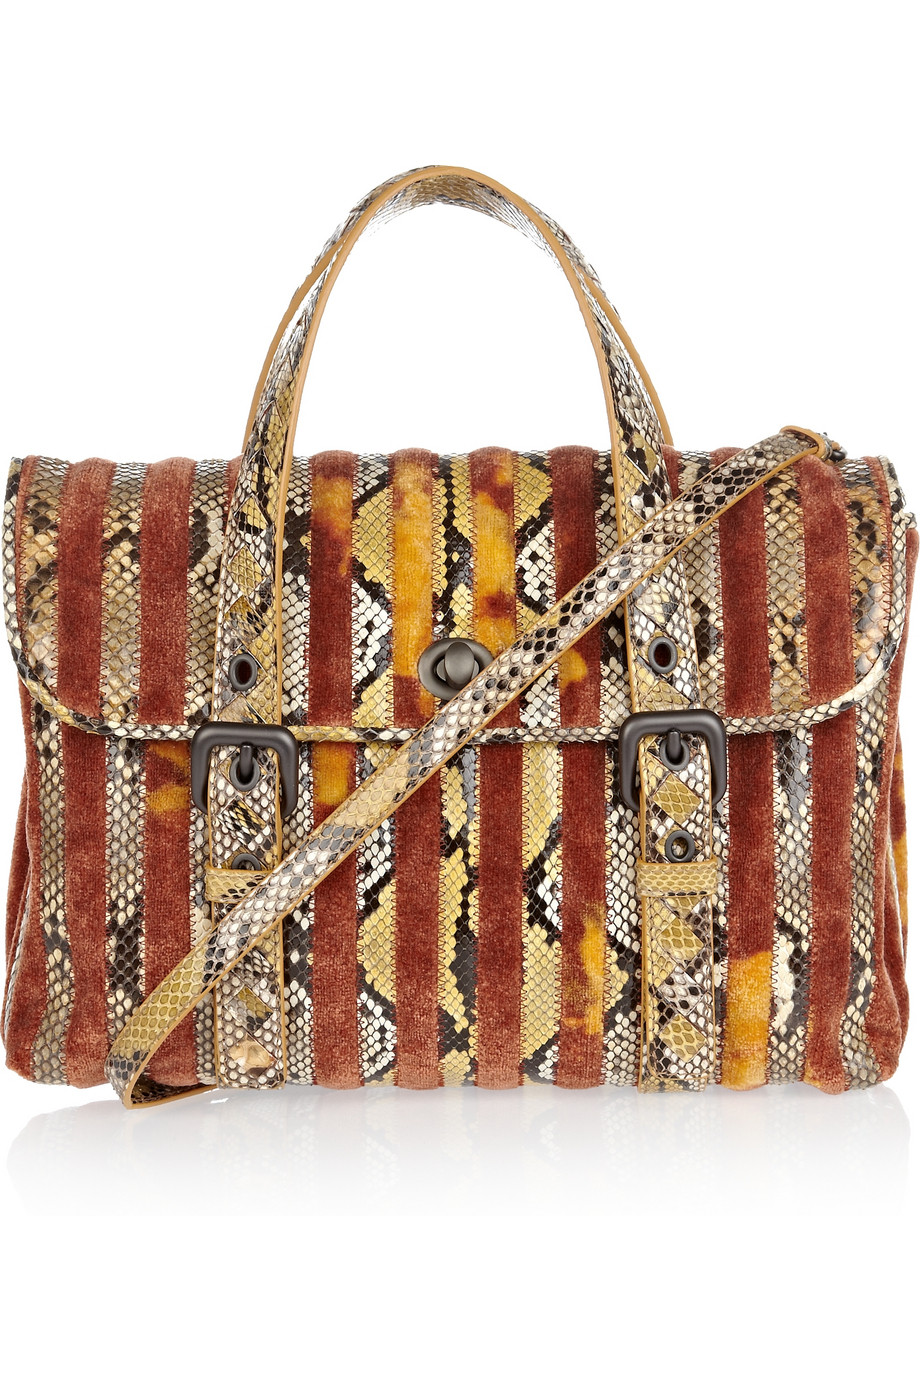 Bottega Veneta Боттега Венета сумки: купить женскую